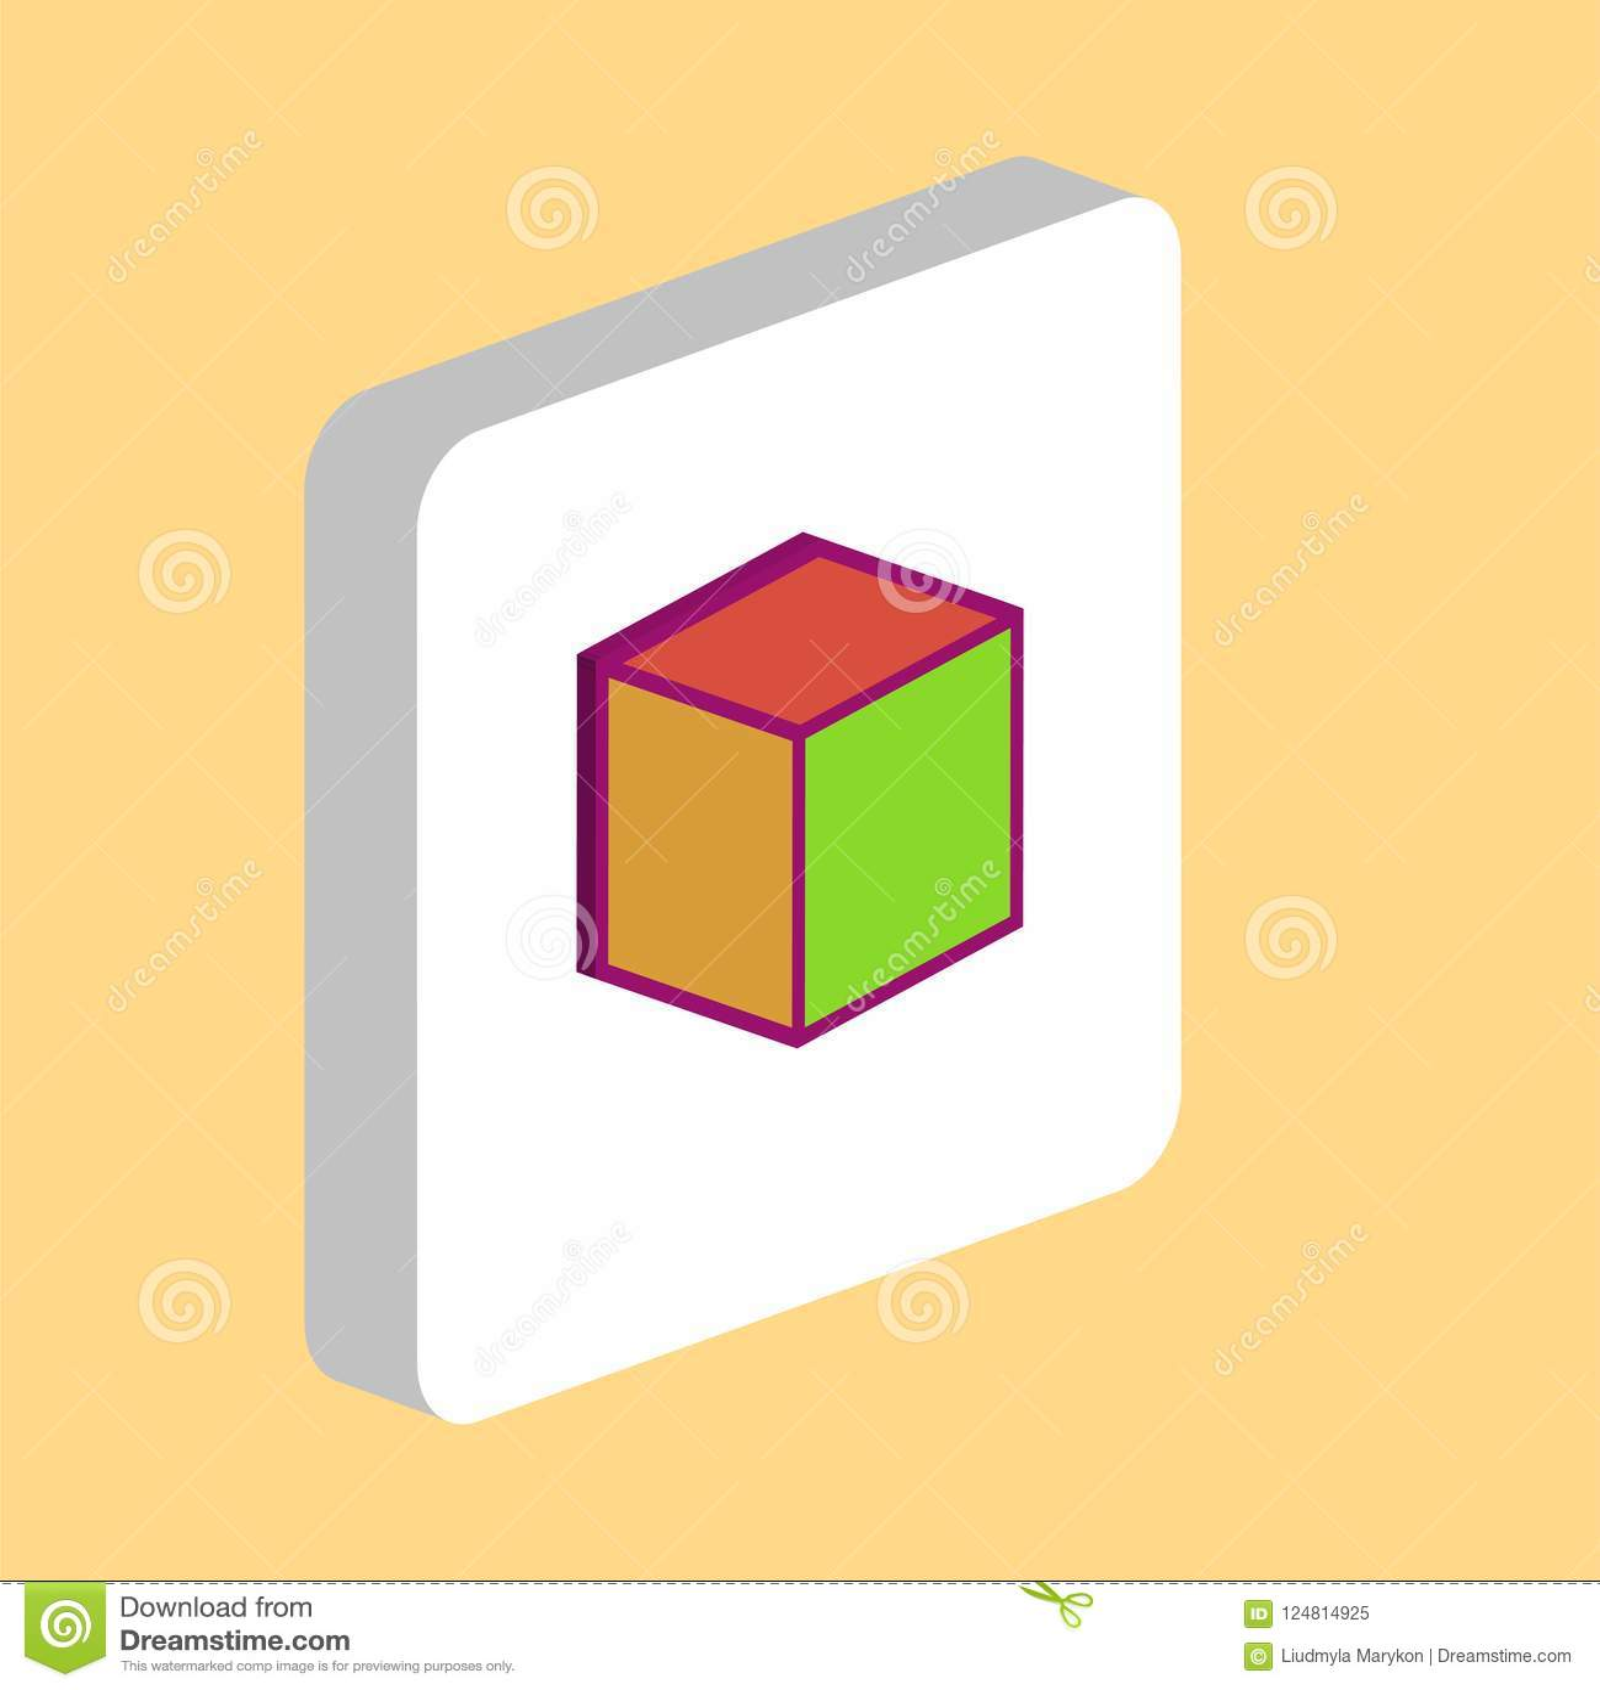 Cube Computer Symbol Stock Vector Illustration Of Cube 124814925